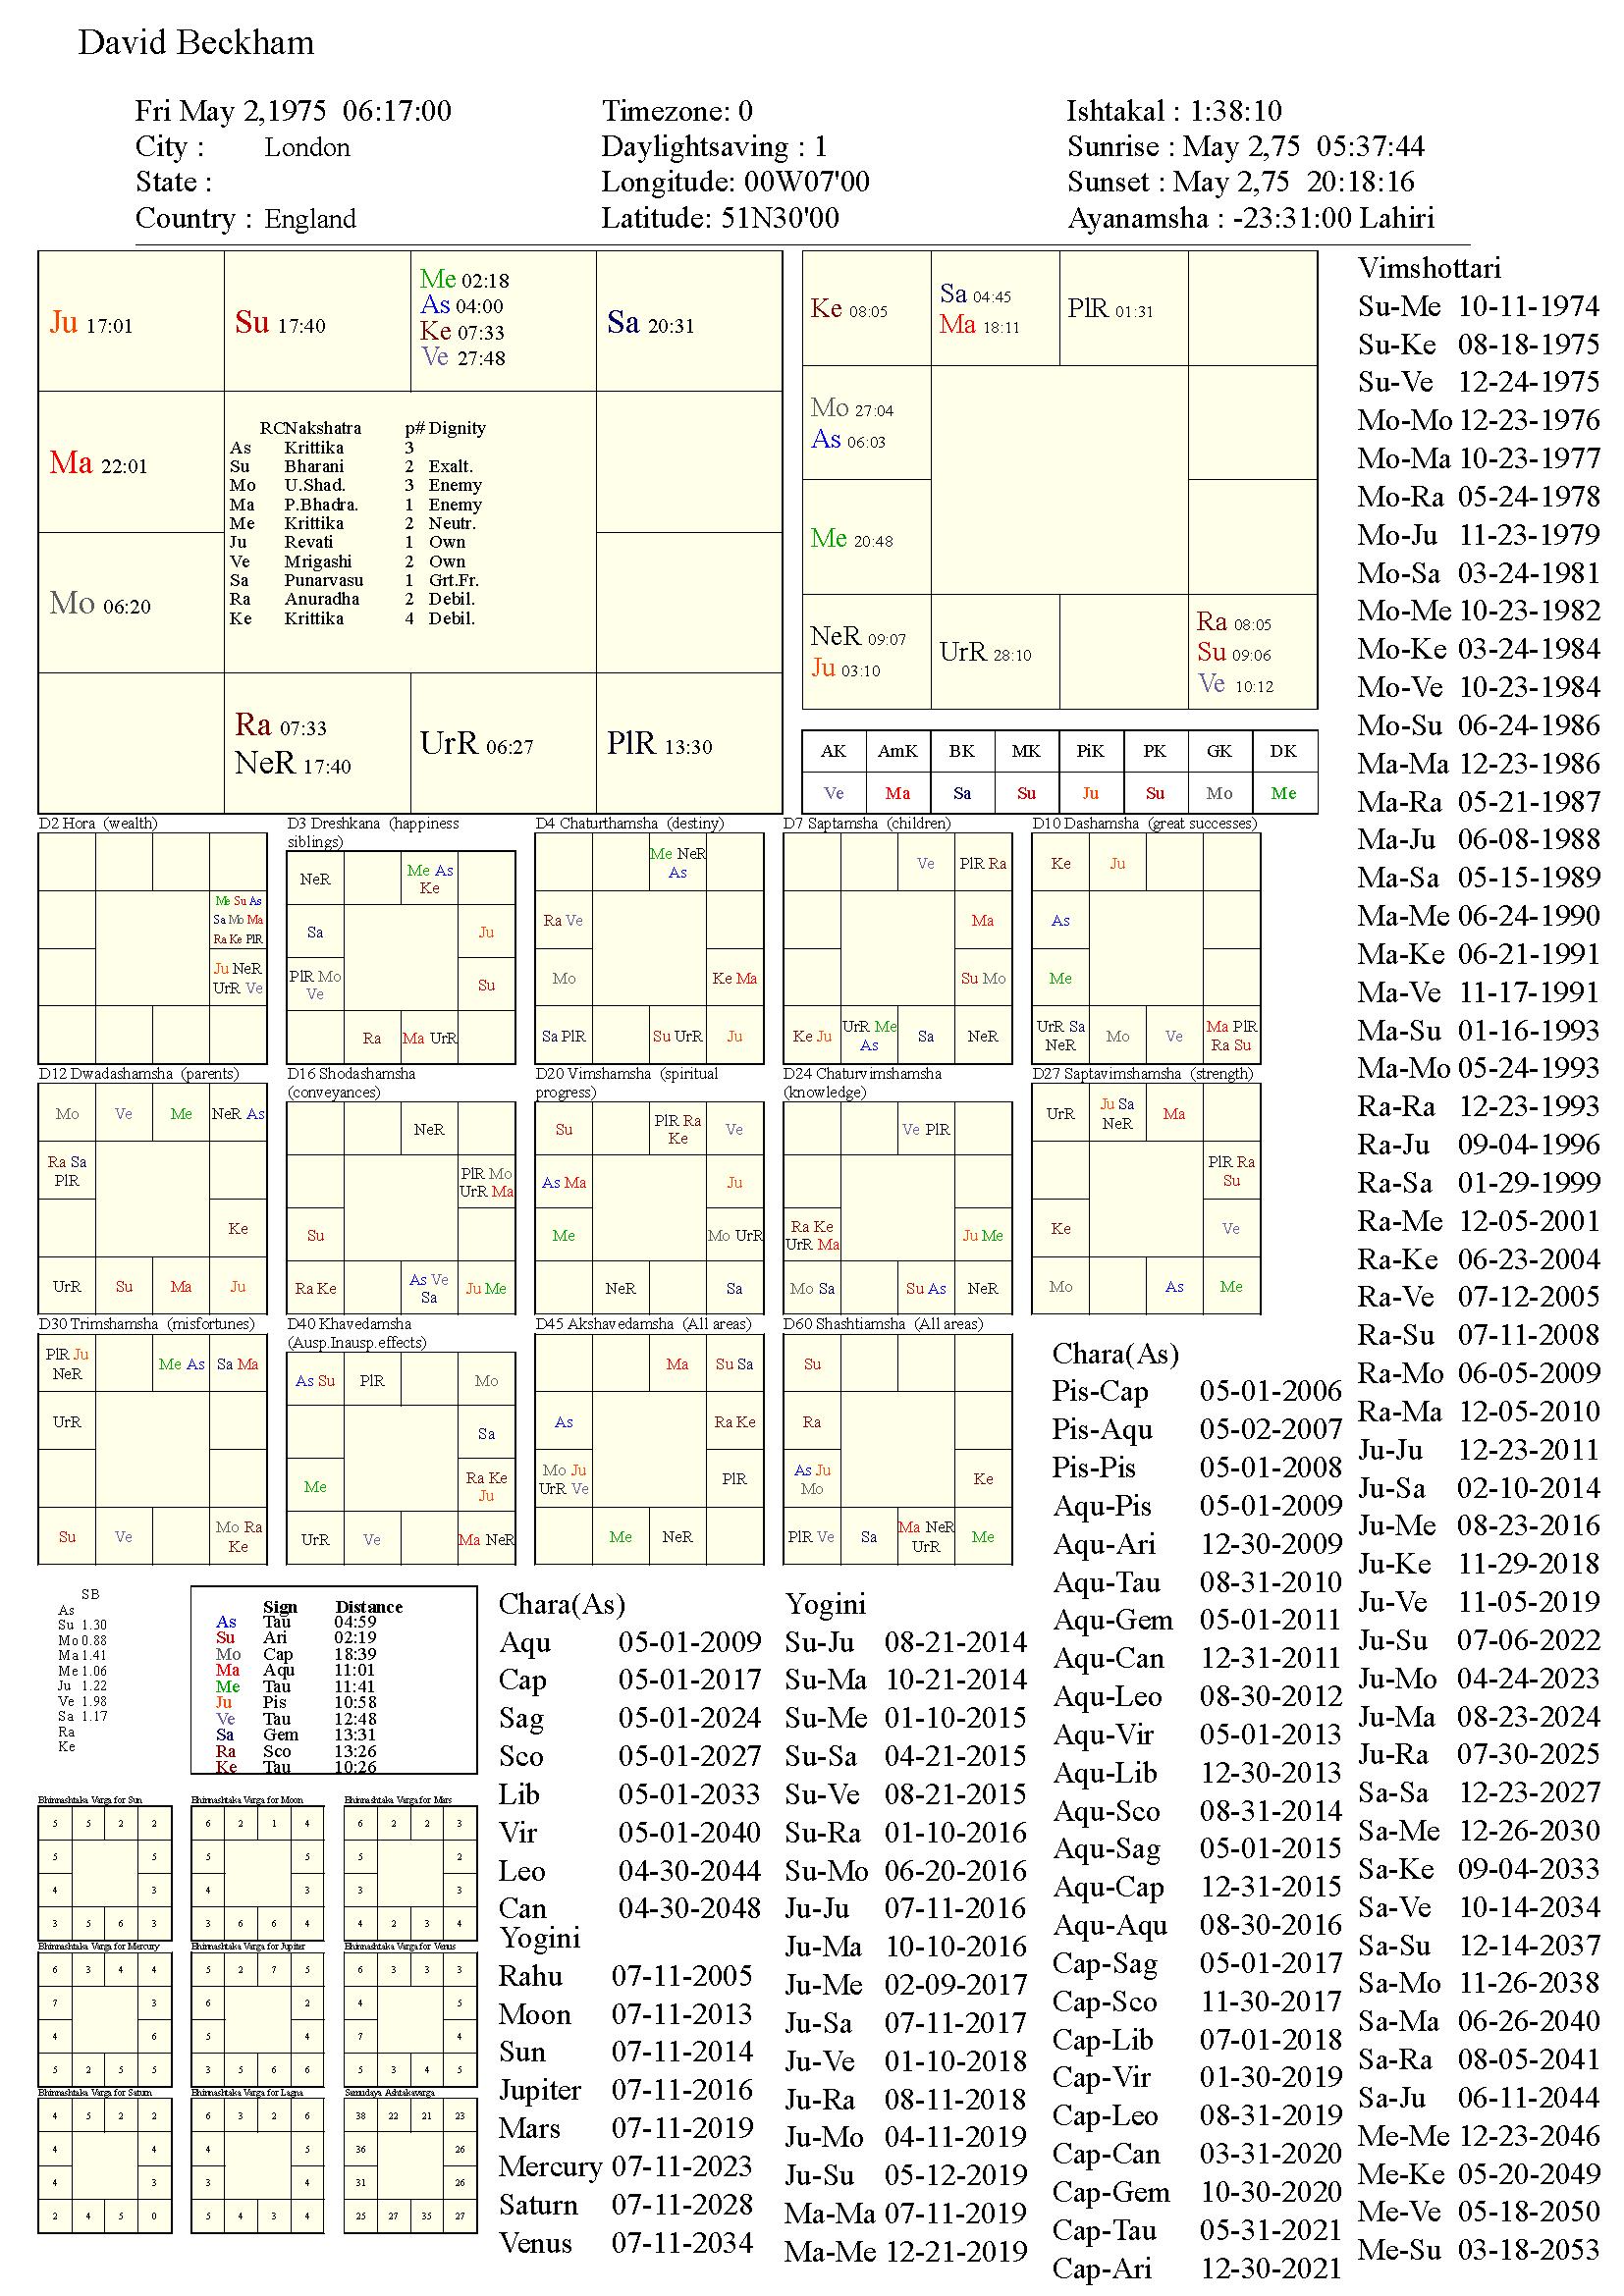 davidbeckham_chart